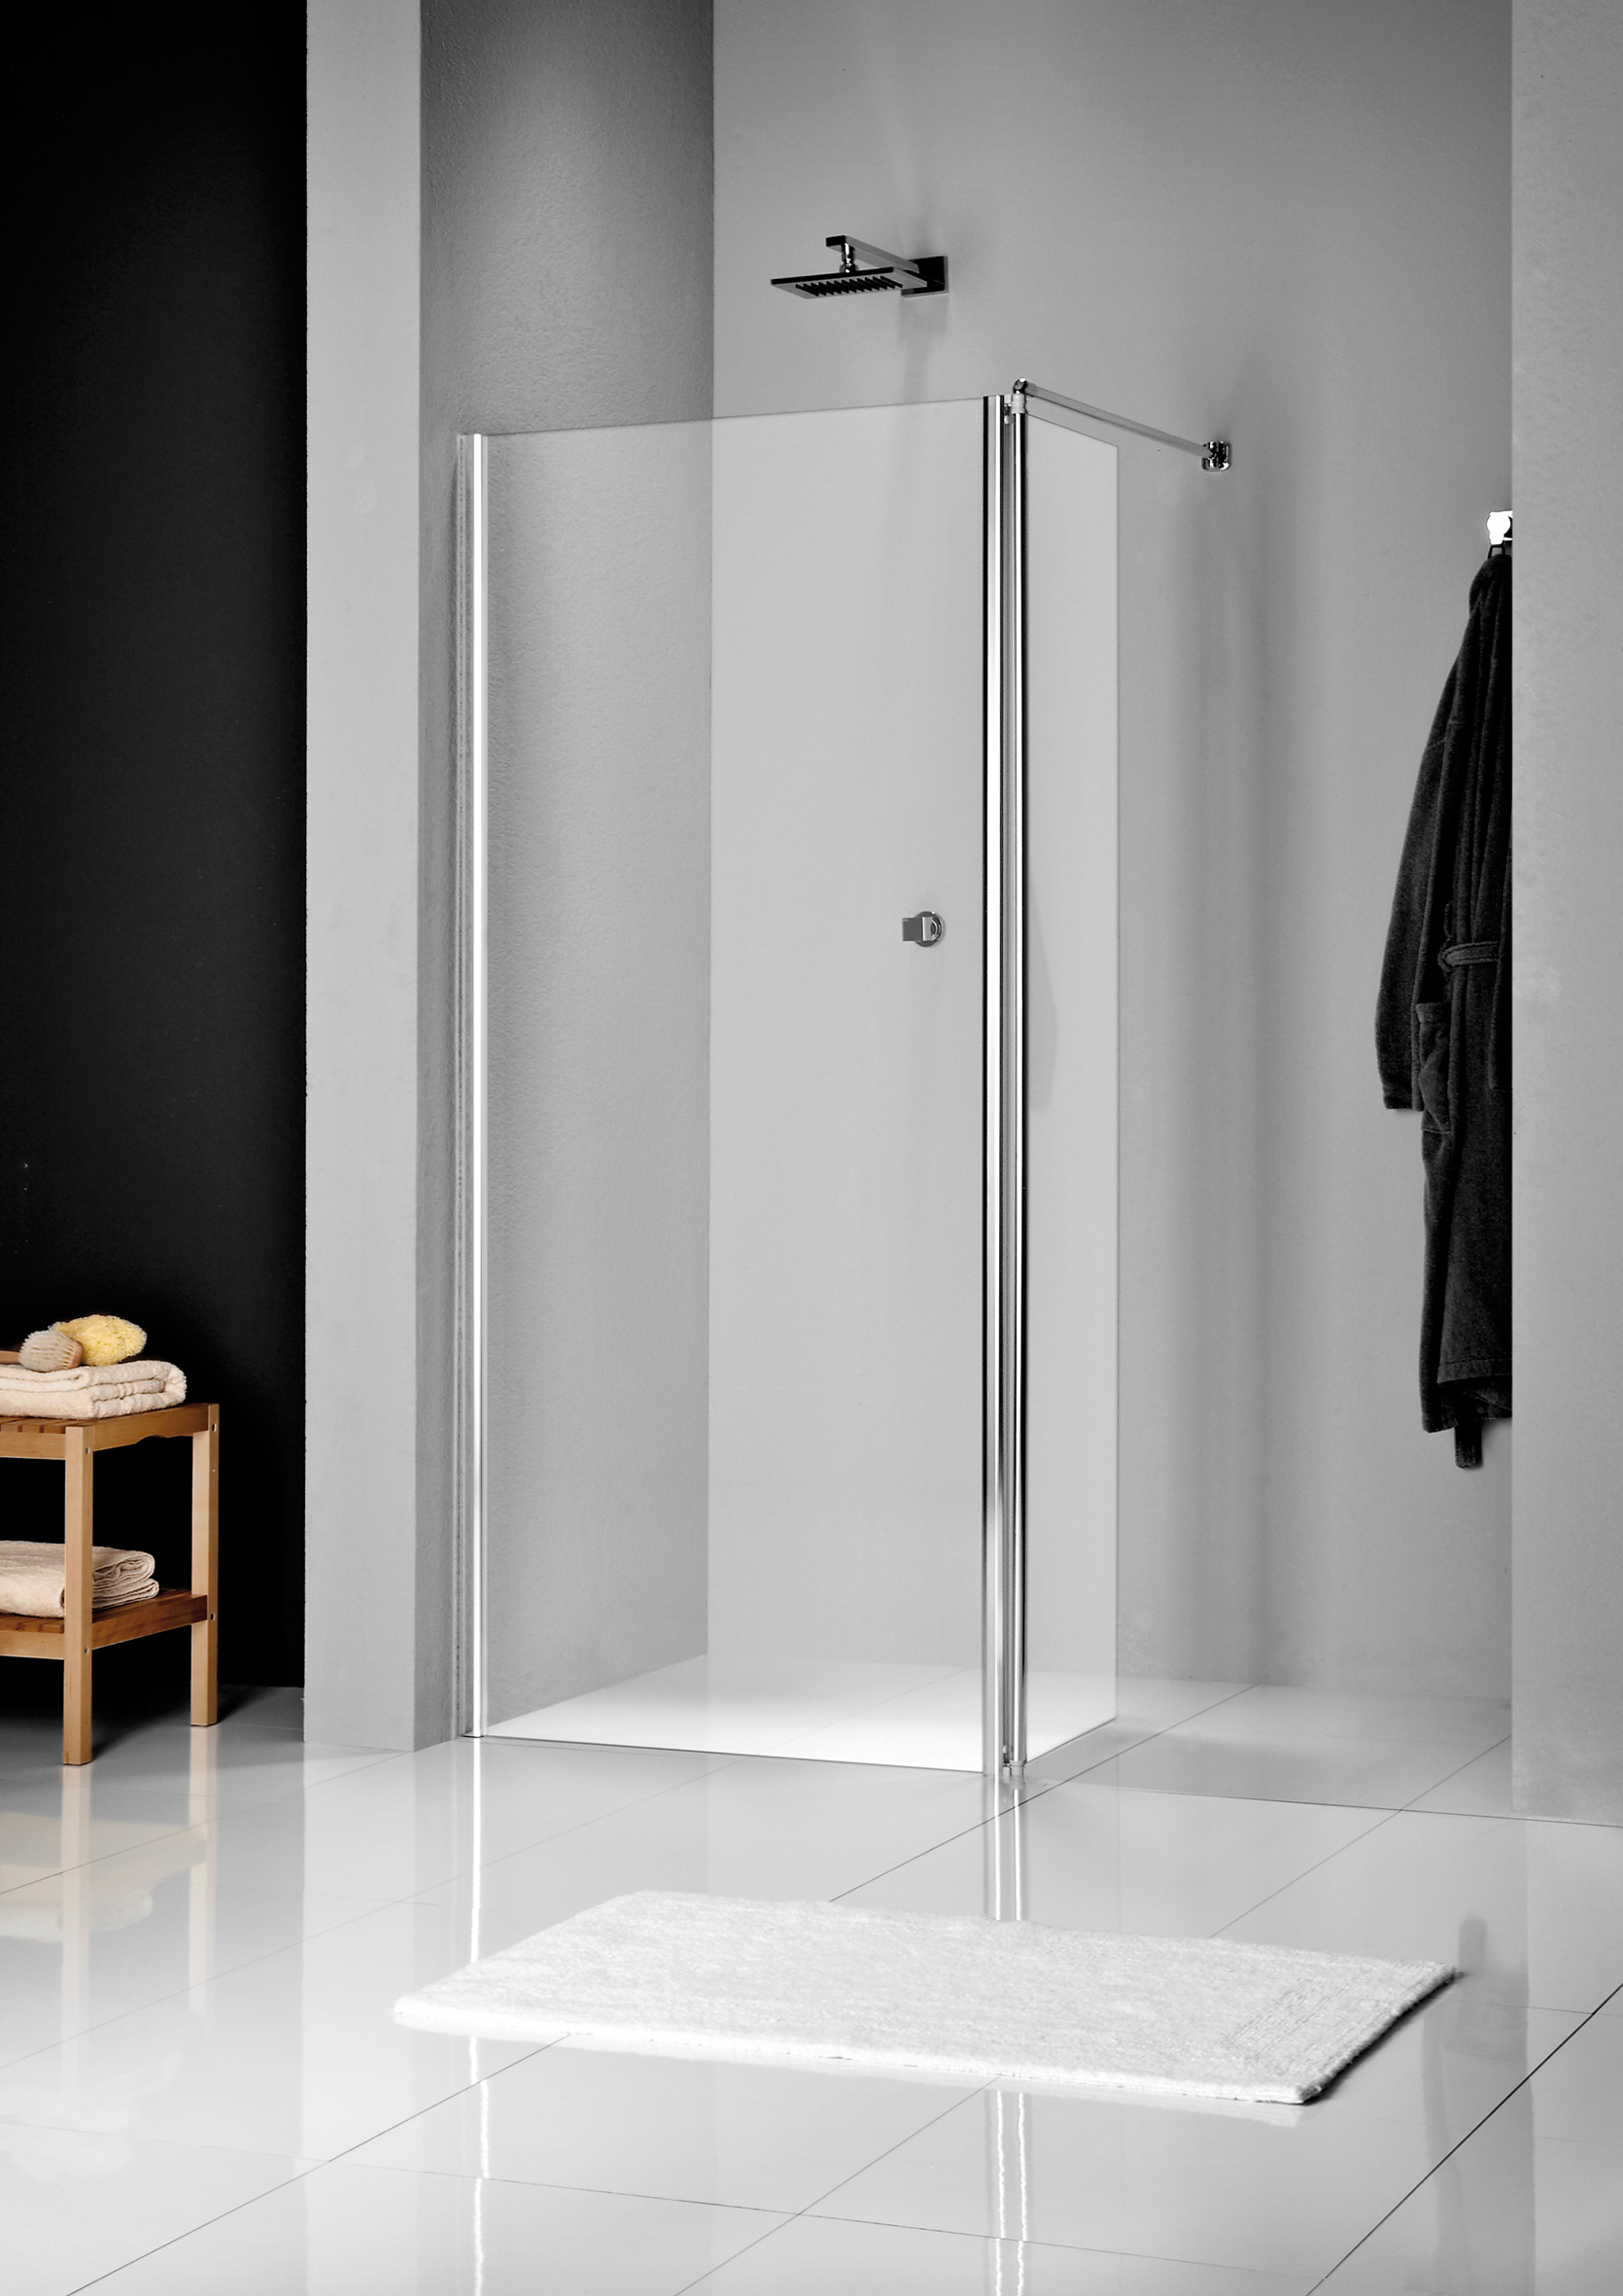 Sealskin Get Wet W205 inloop type a1 160x200cm mat zilver profiel en helder glas